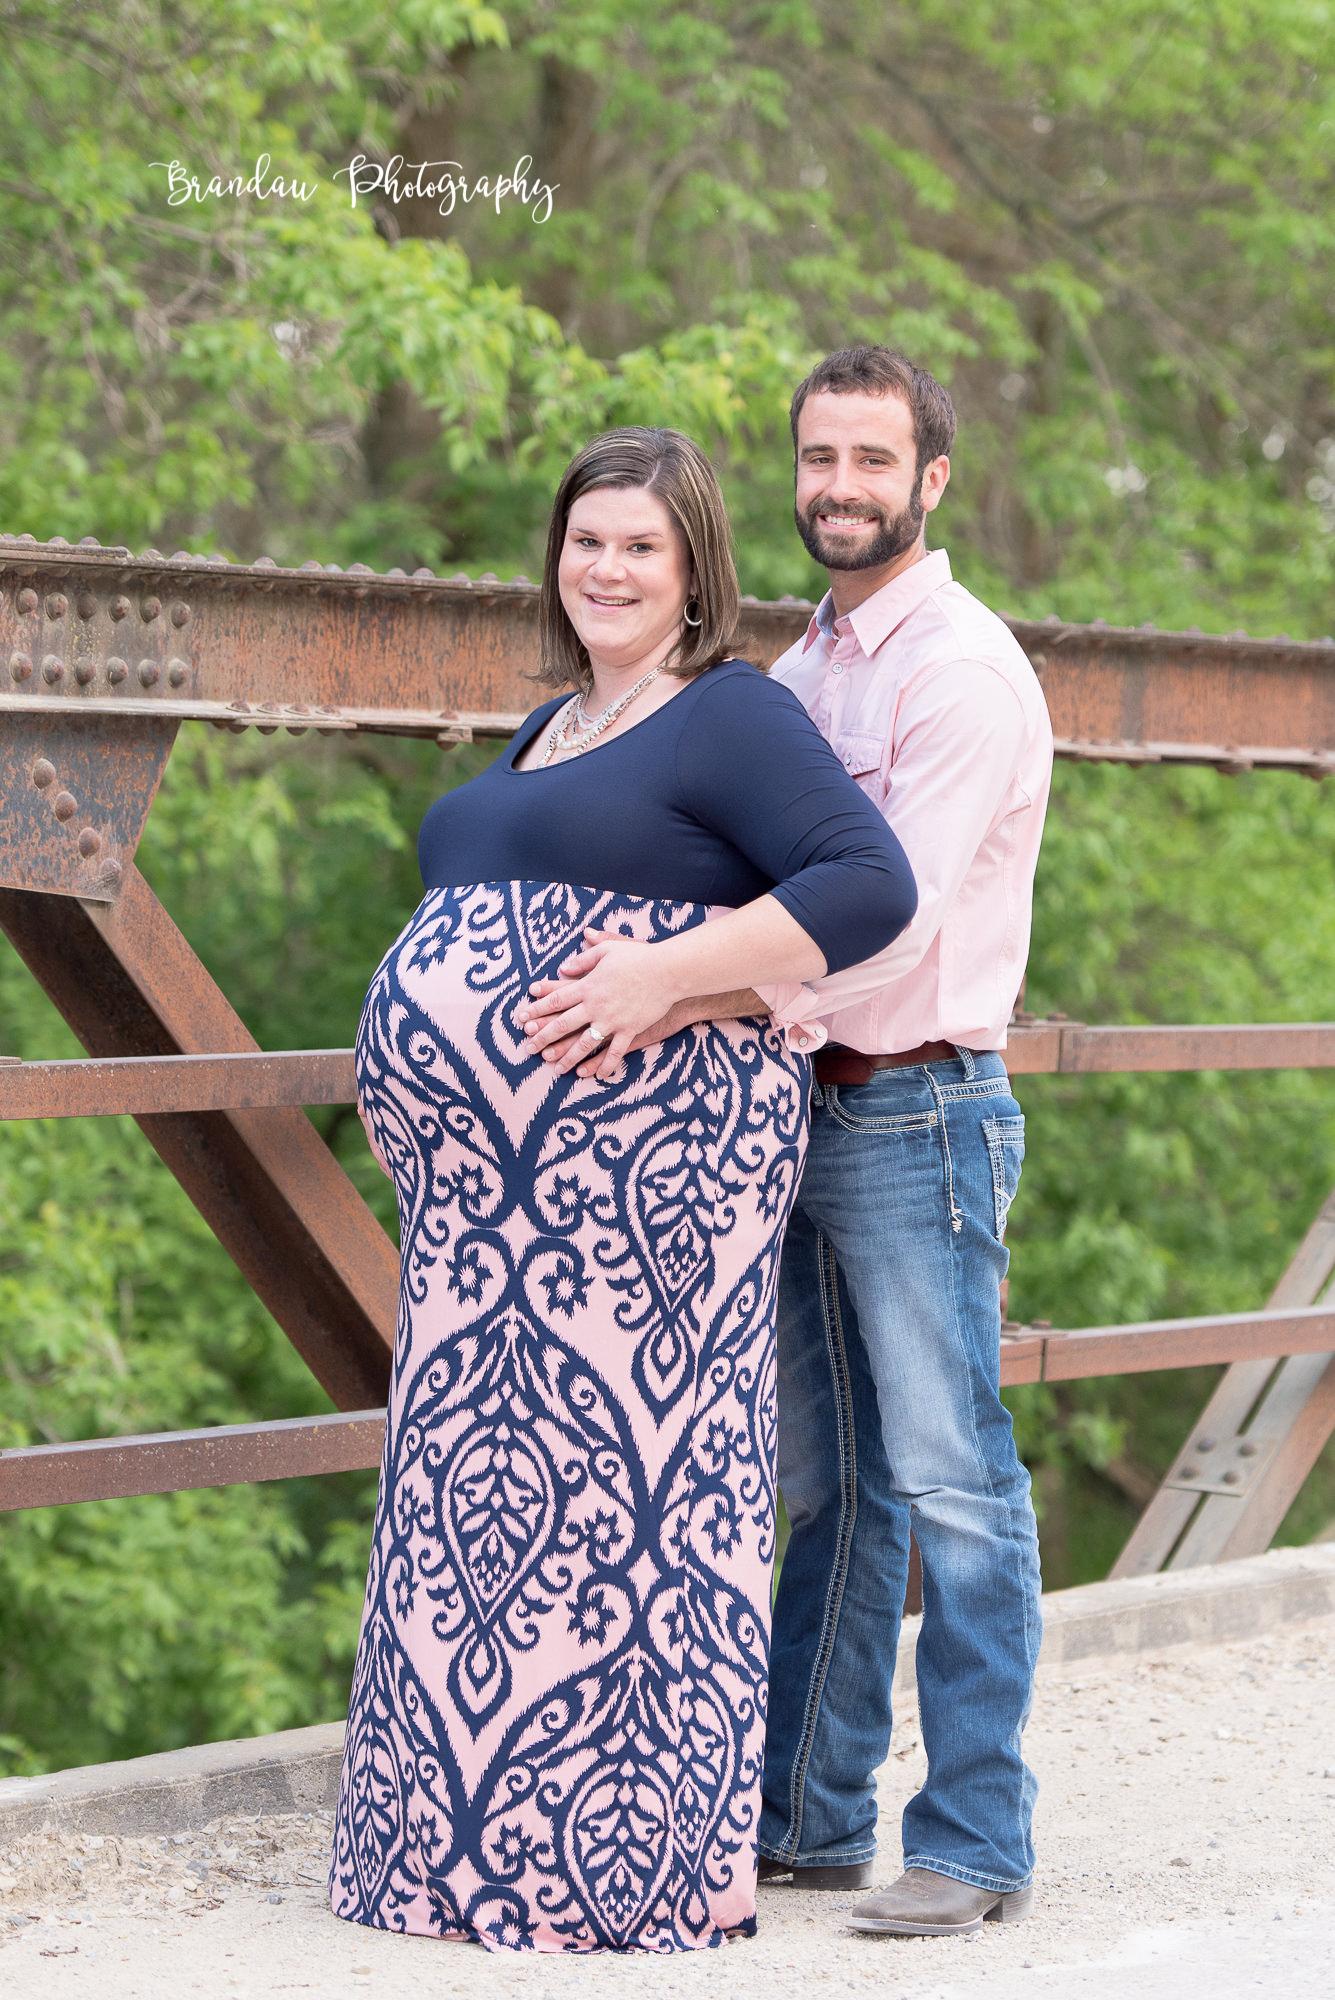 Engagement Man Woman Bridge_Brandau Photography-22.jpg